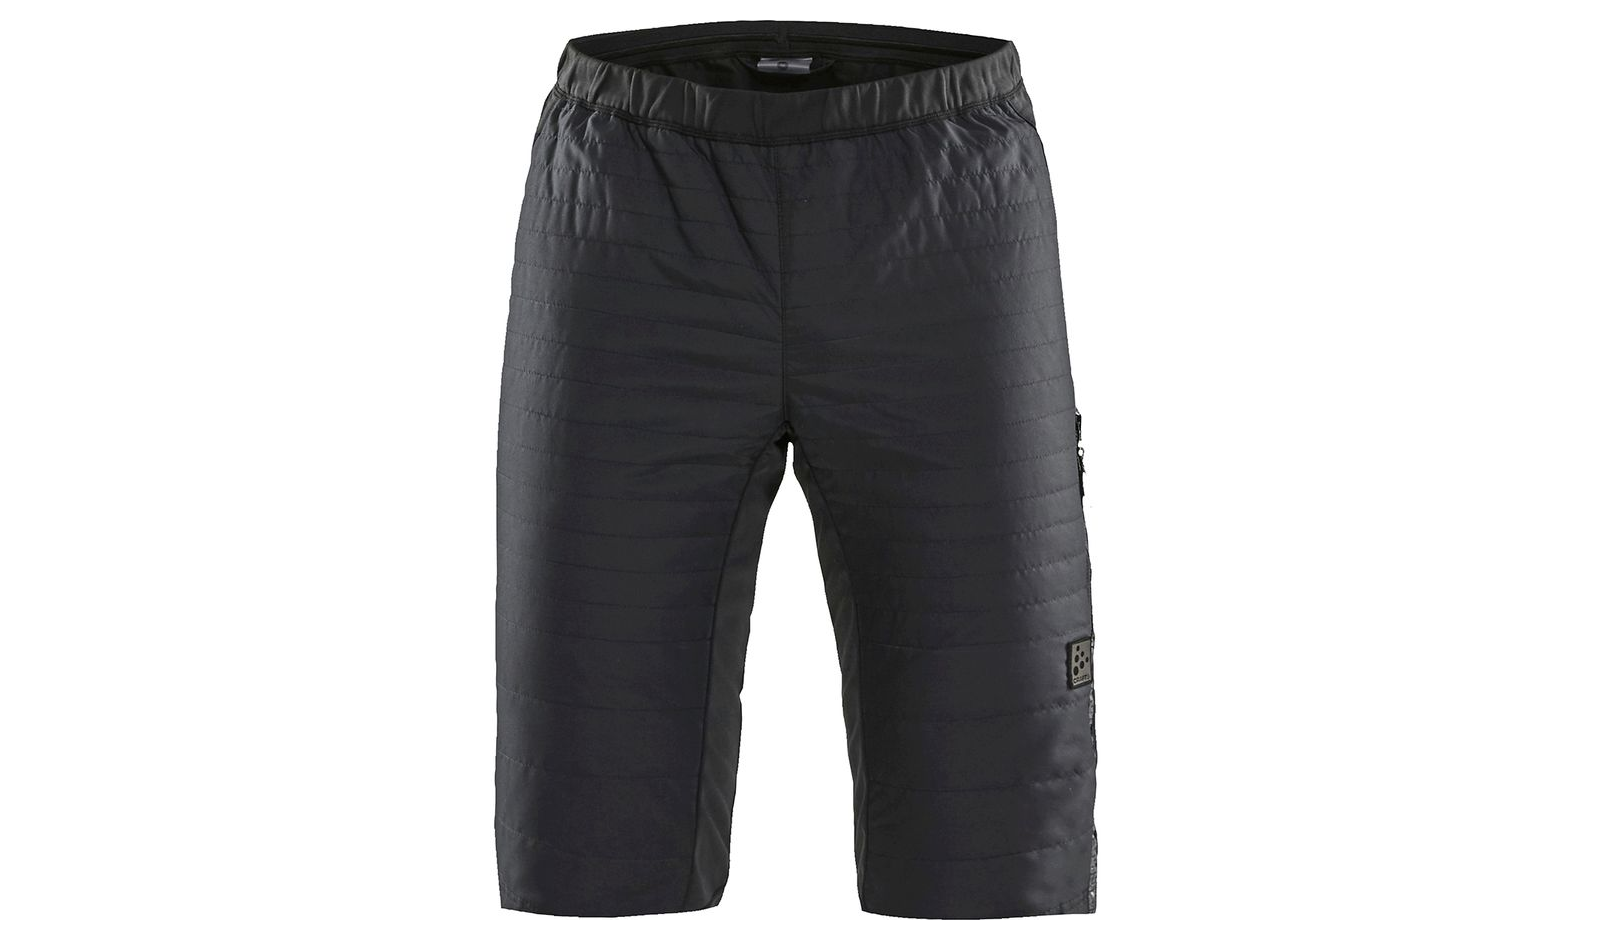 craft men's padded shorts